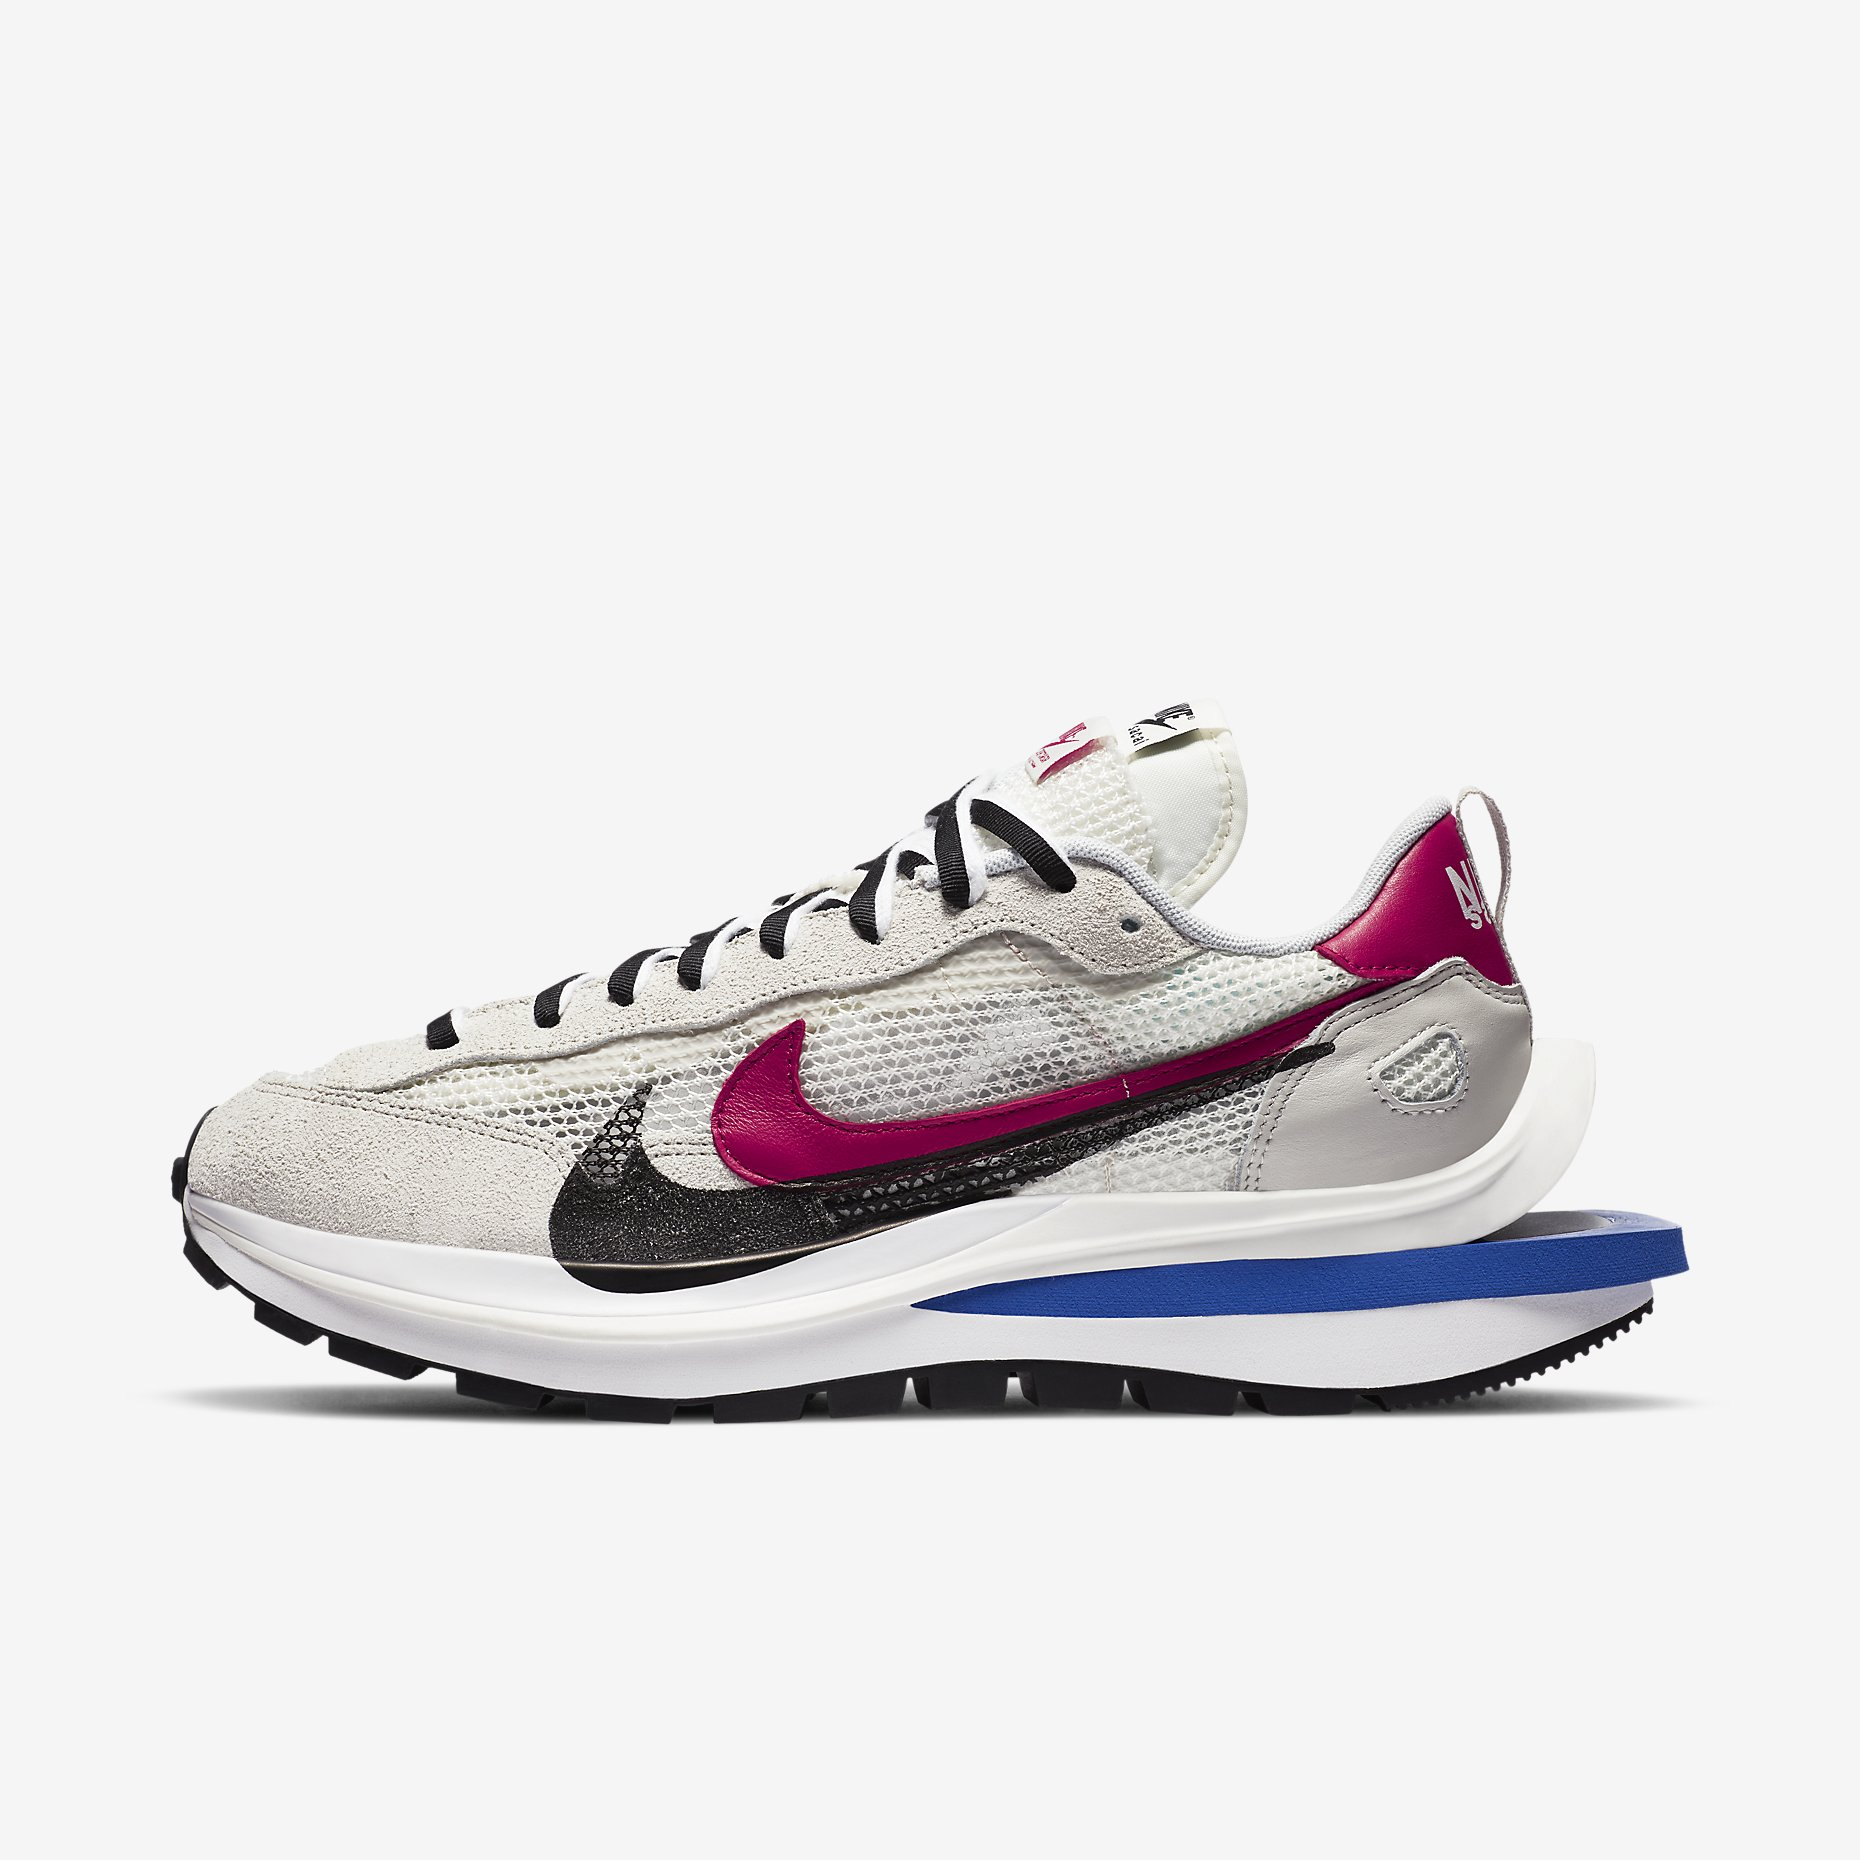 Nike x Sacai VaporWaffle 'Royal Fuchsia'}